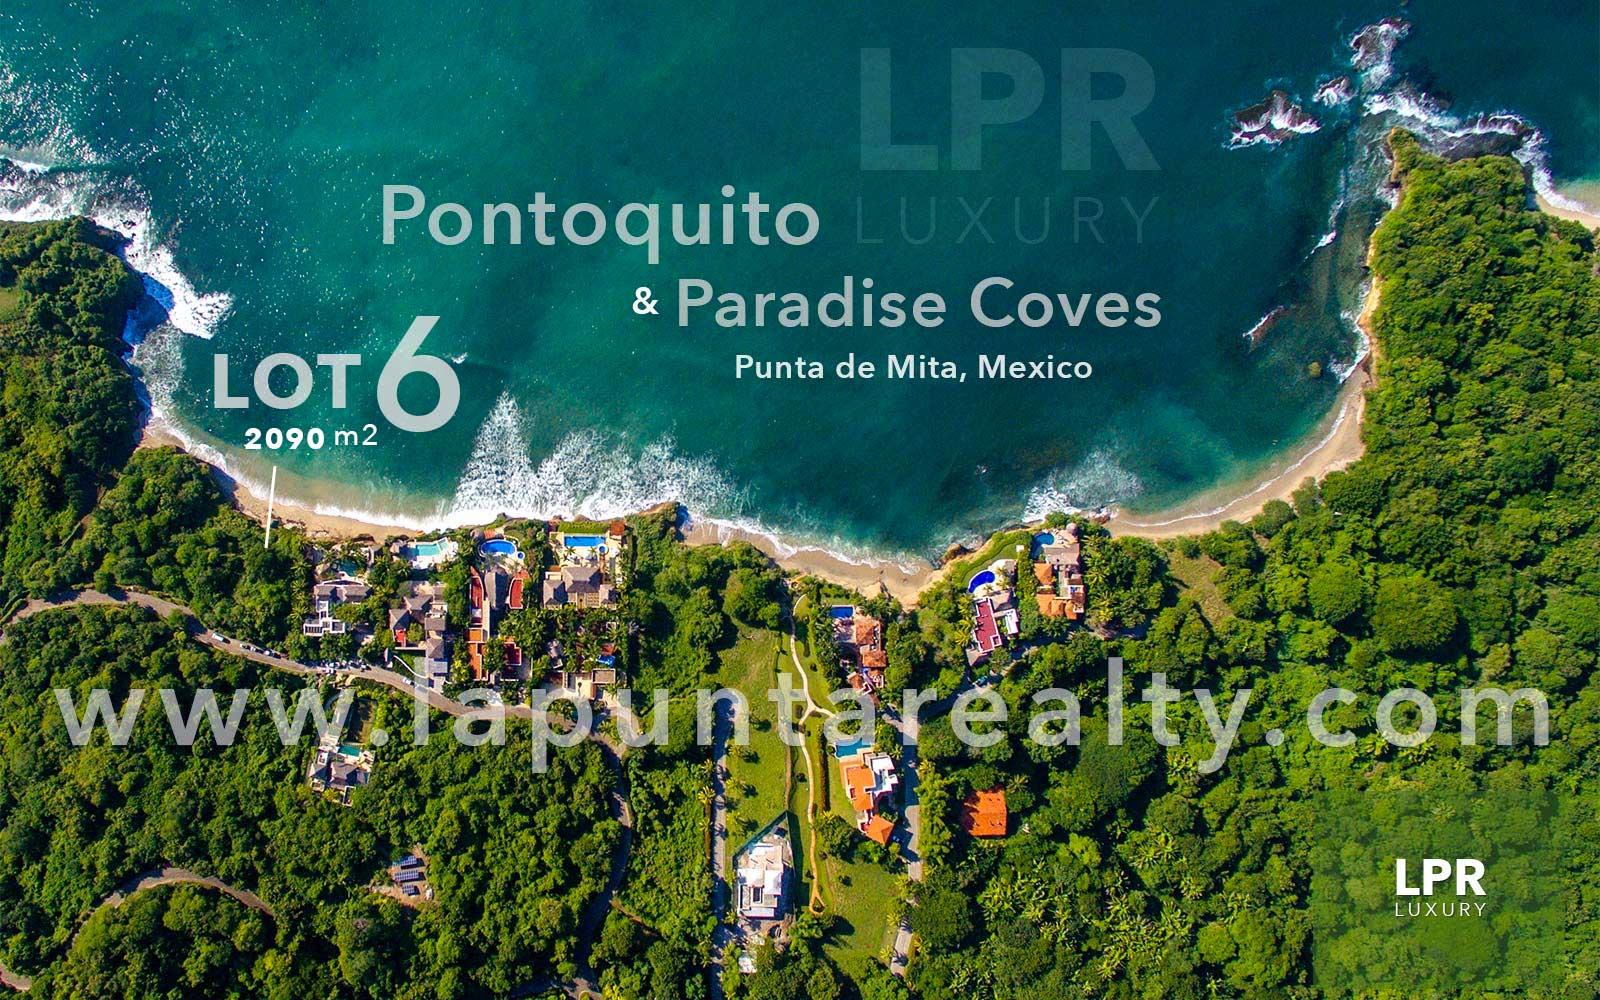 Pontoquito – Lot 6 Punta de Mita, Riviera Nayarit - Luxury Puerto Vallarta real estate